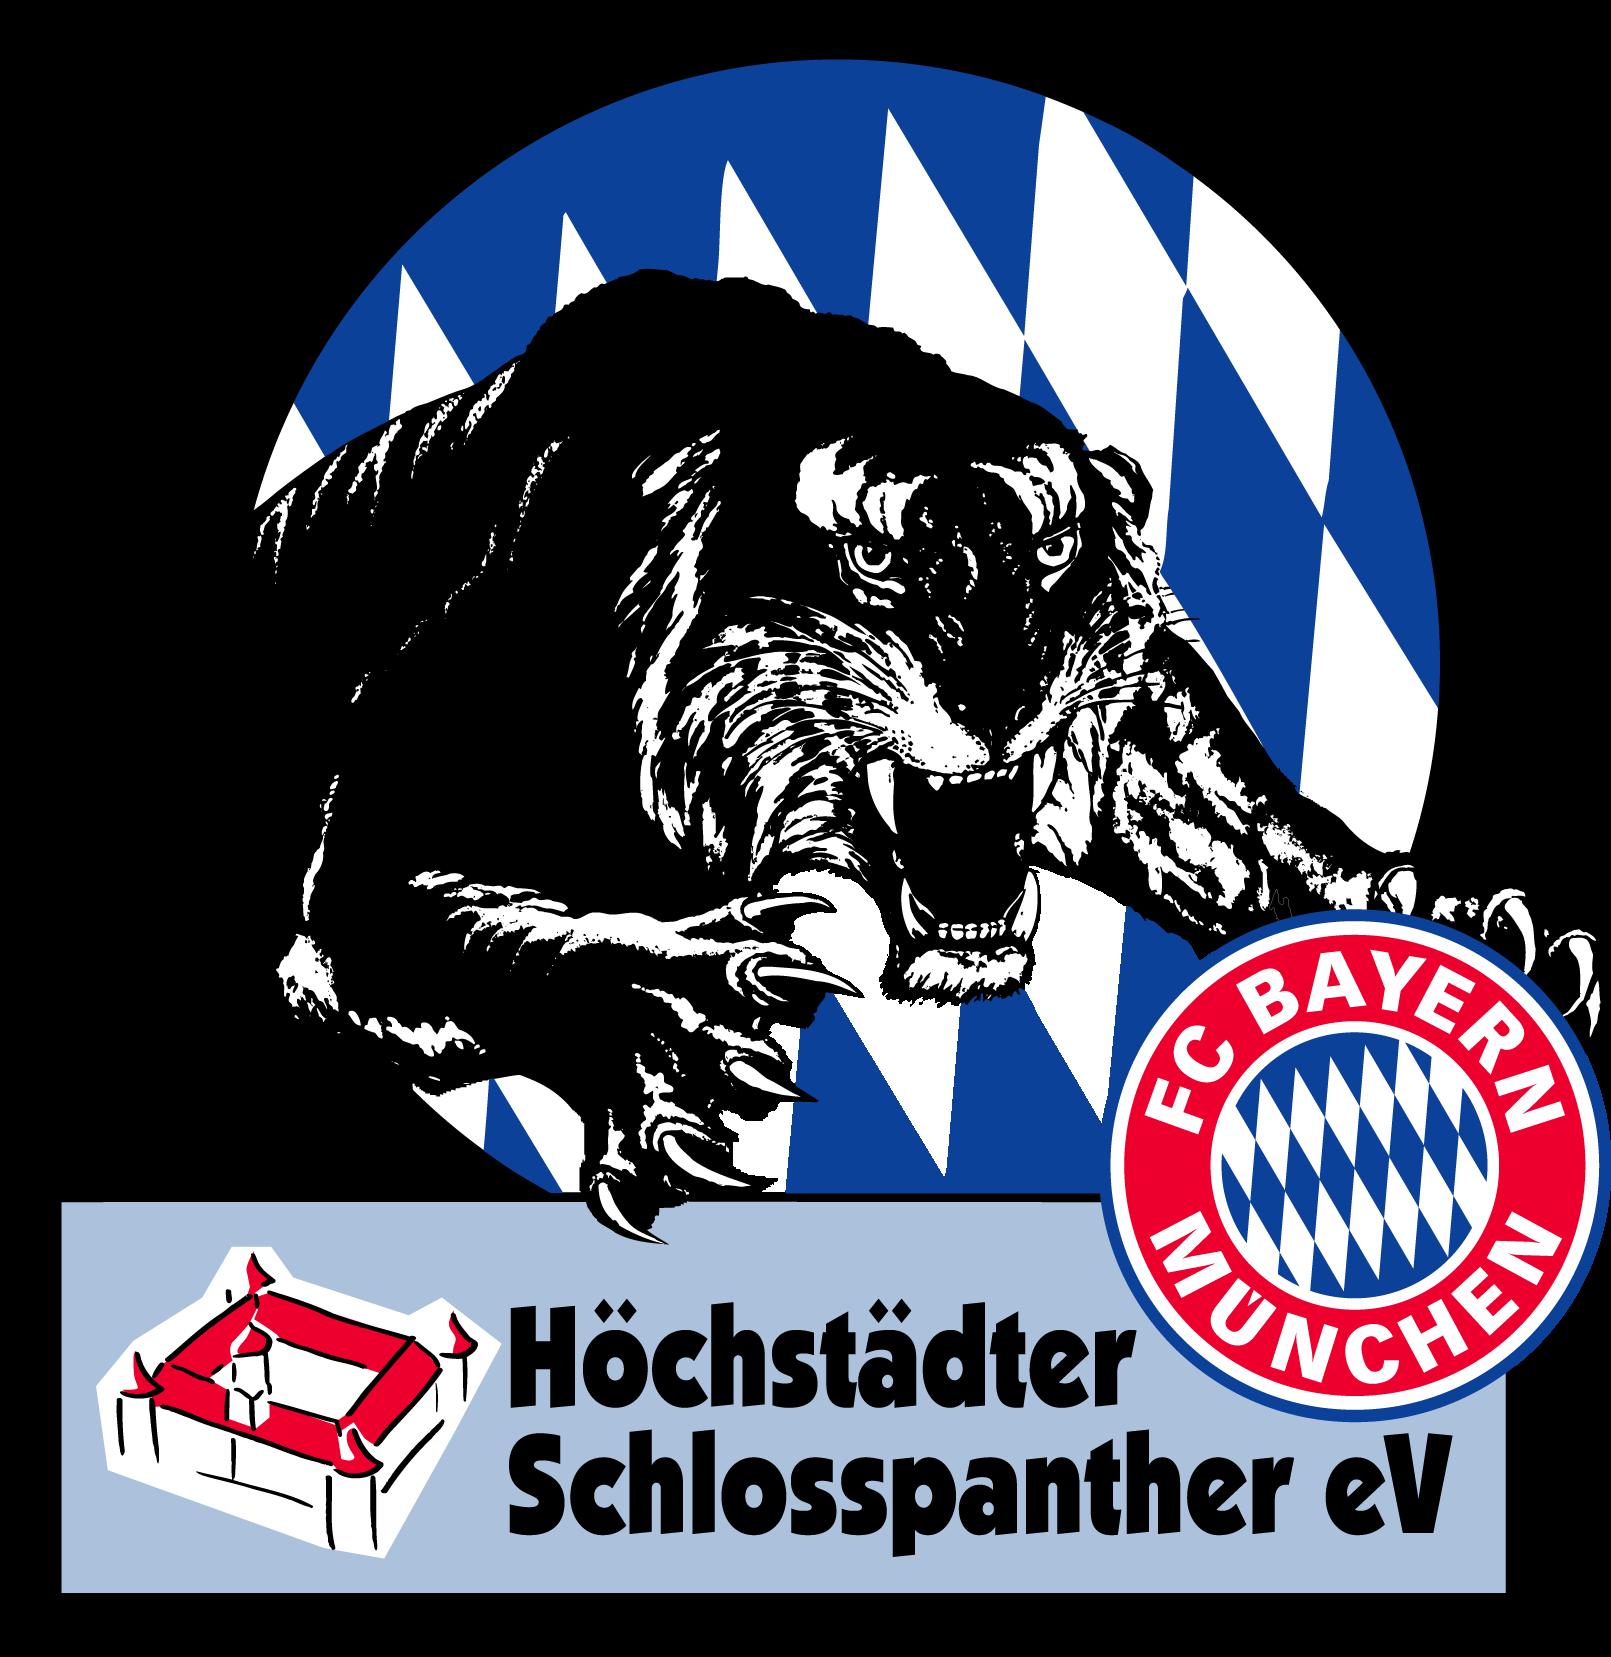 Höchstädter Schlosspanther e.V.